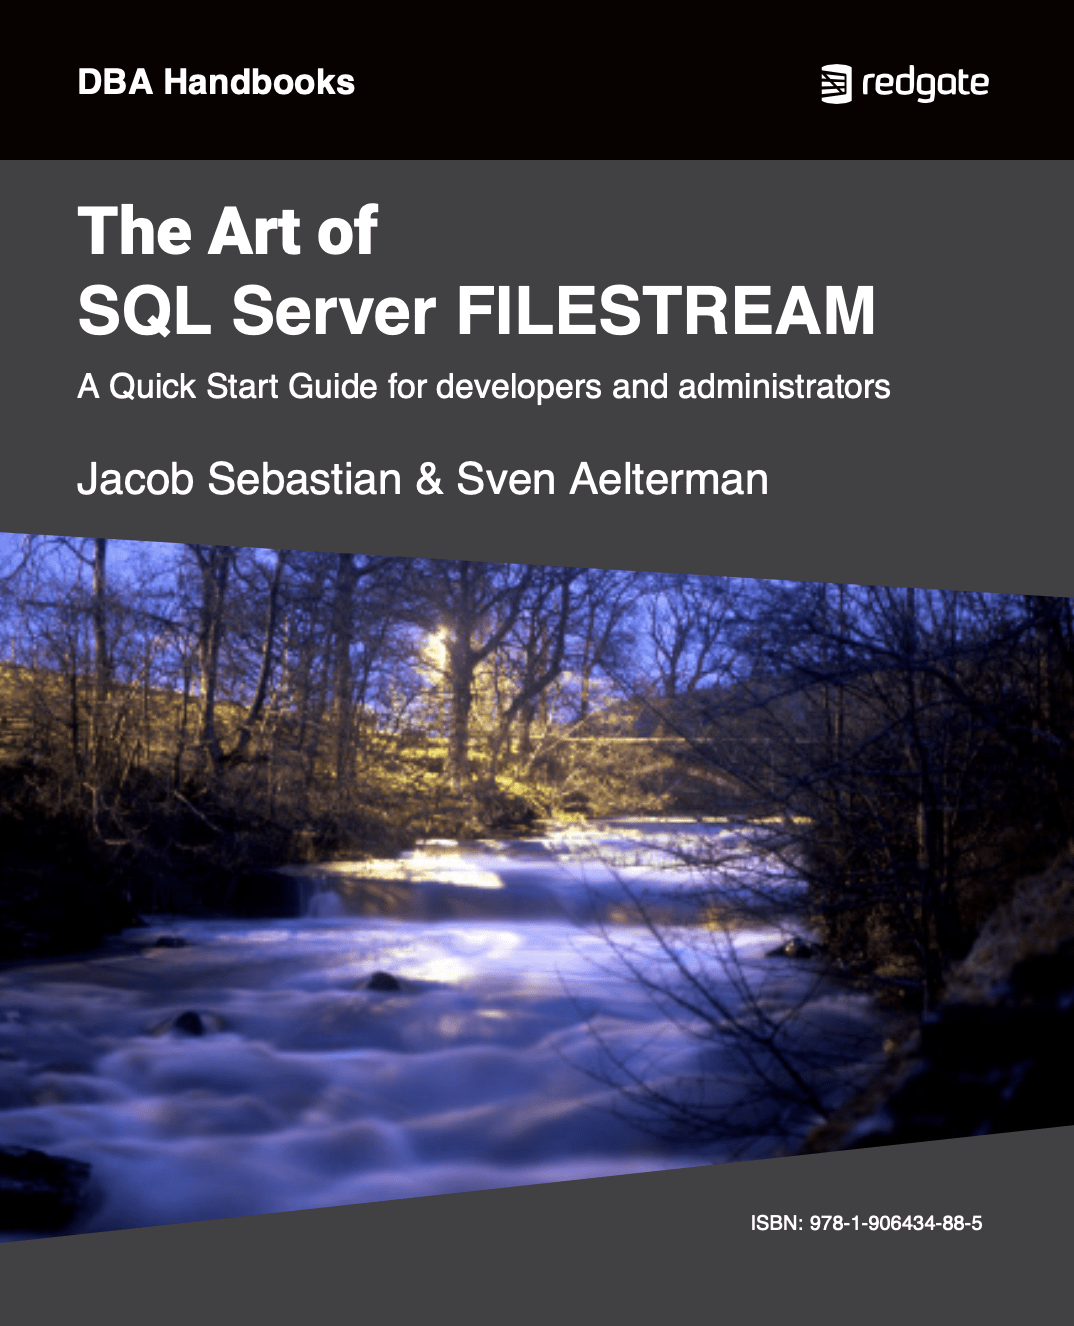 The Art of SQL Server Filesteam eBook cover